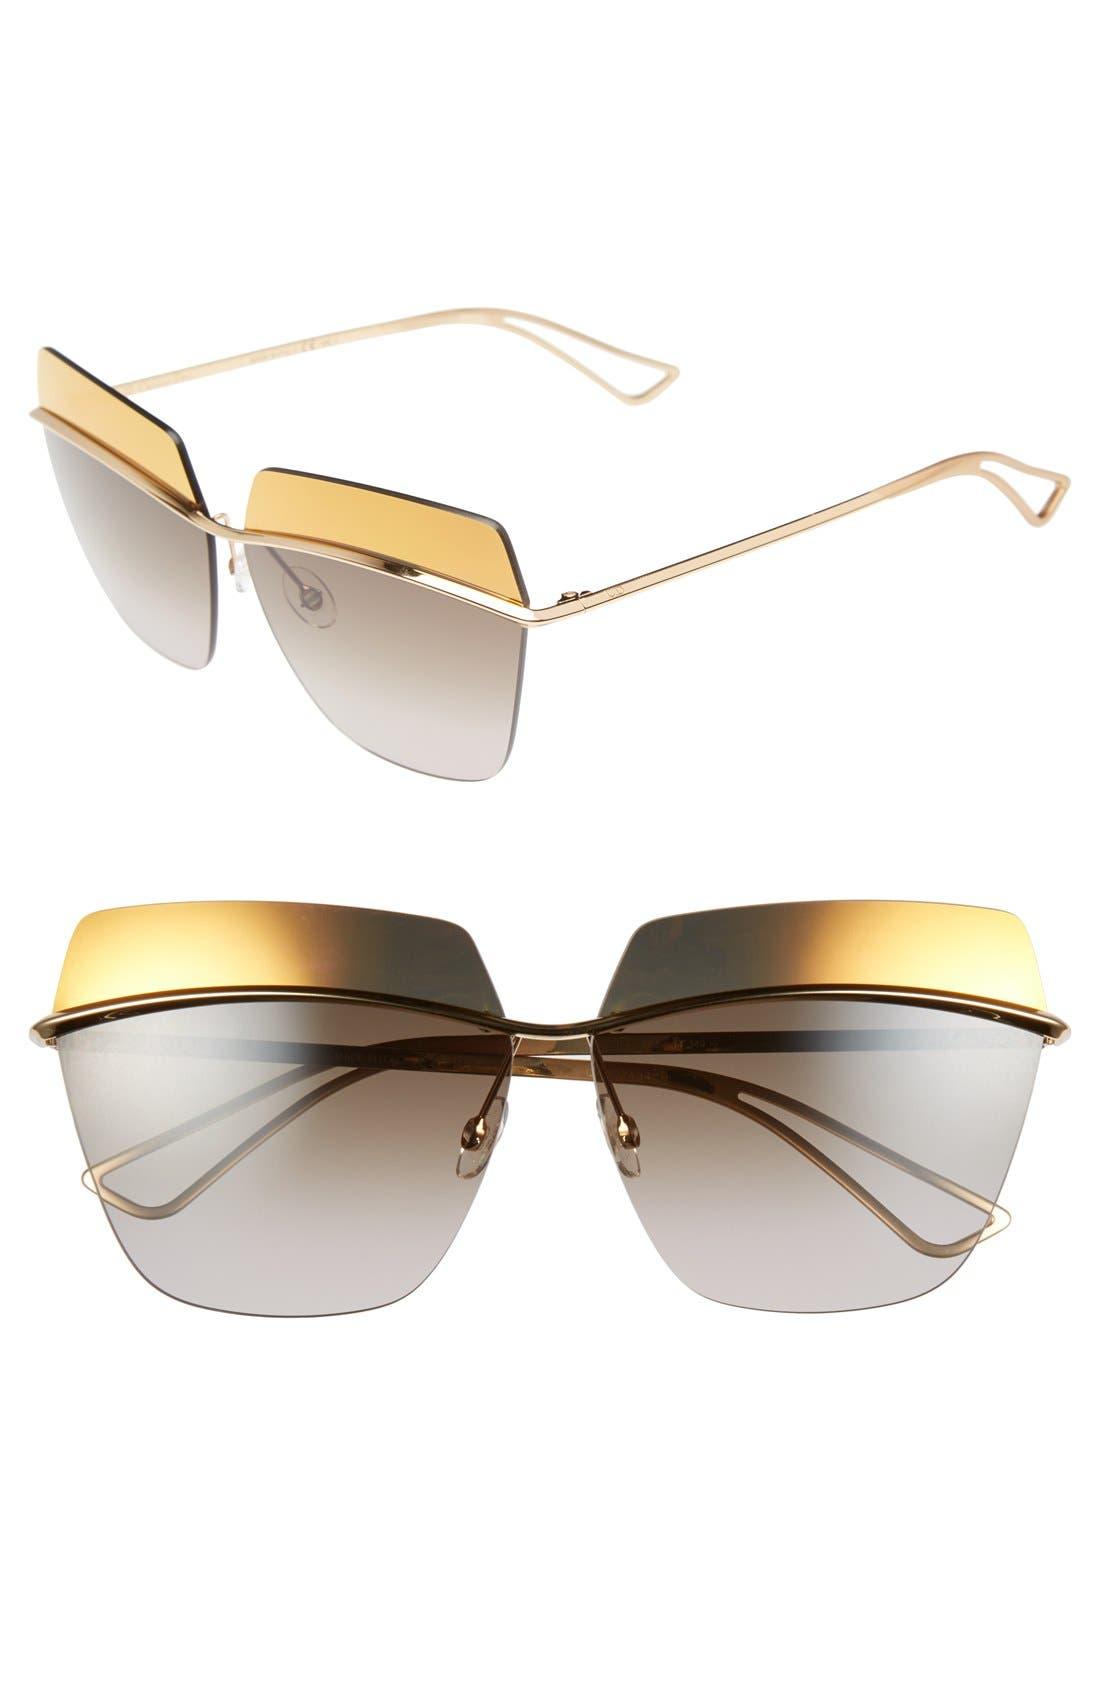 Main Image - Dior 63mm Retro Metal Sunglasses